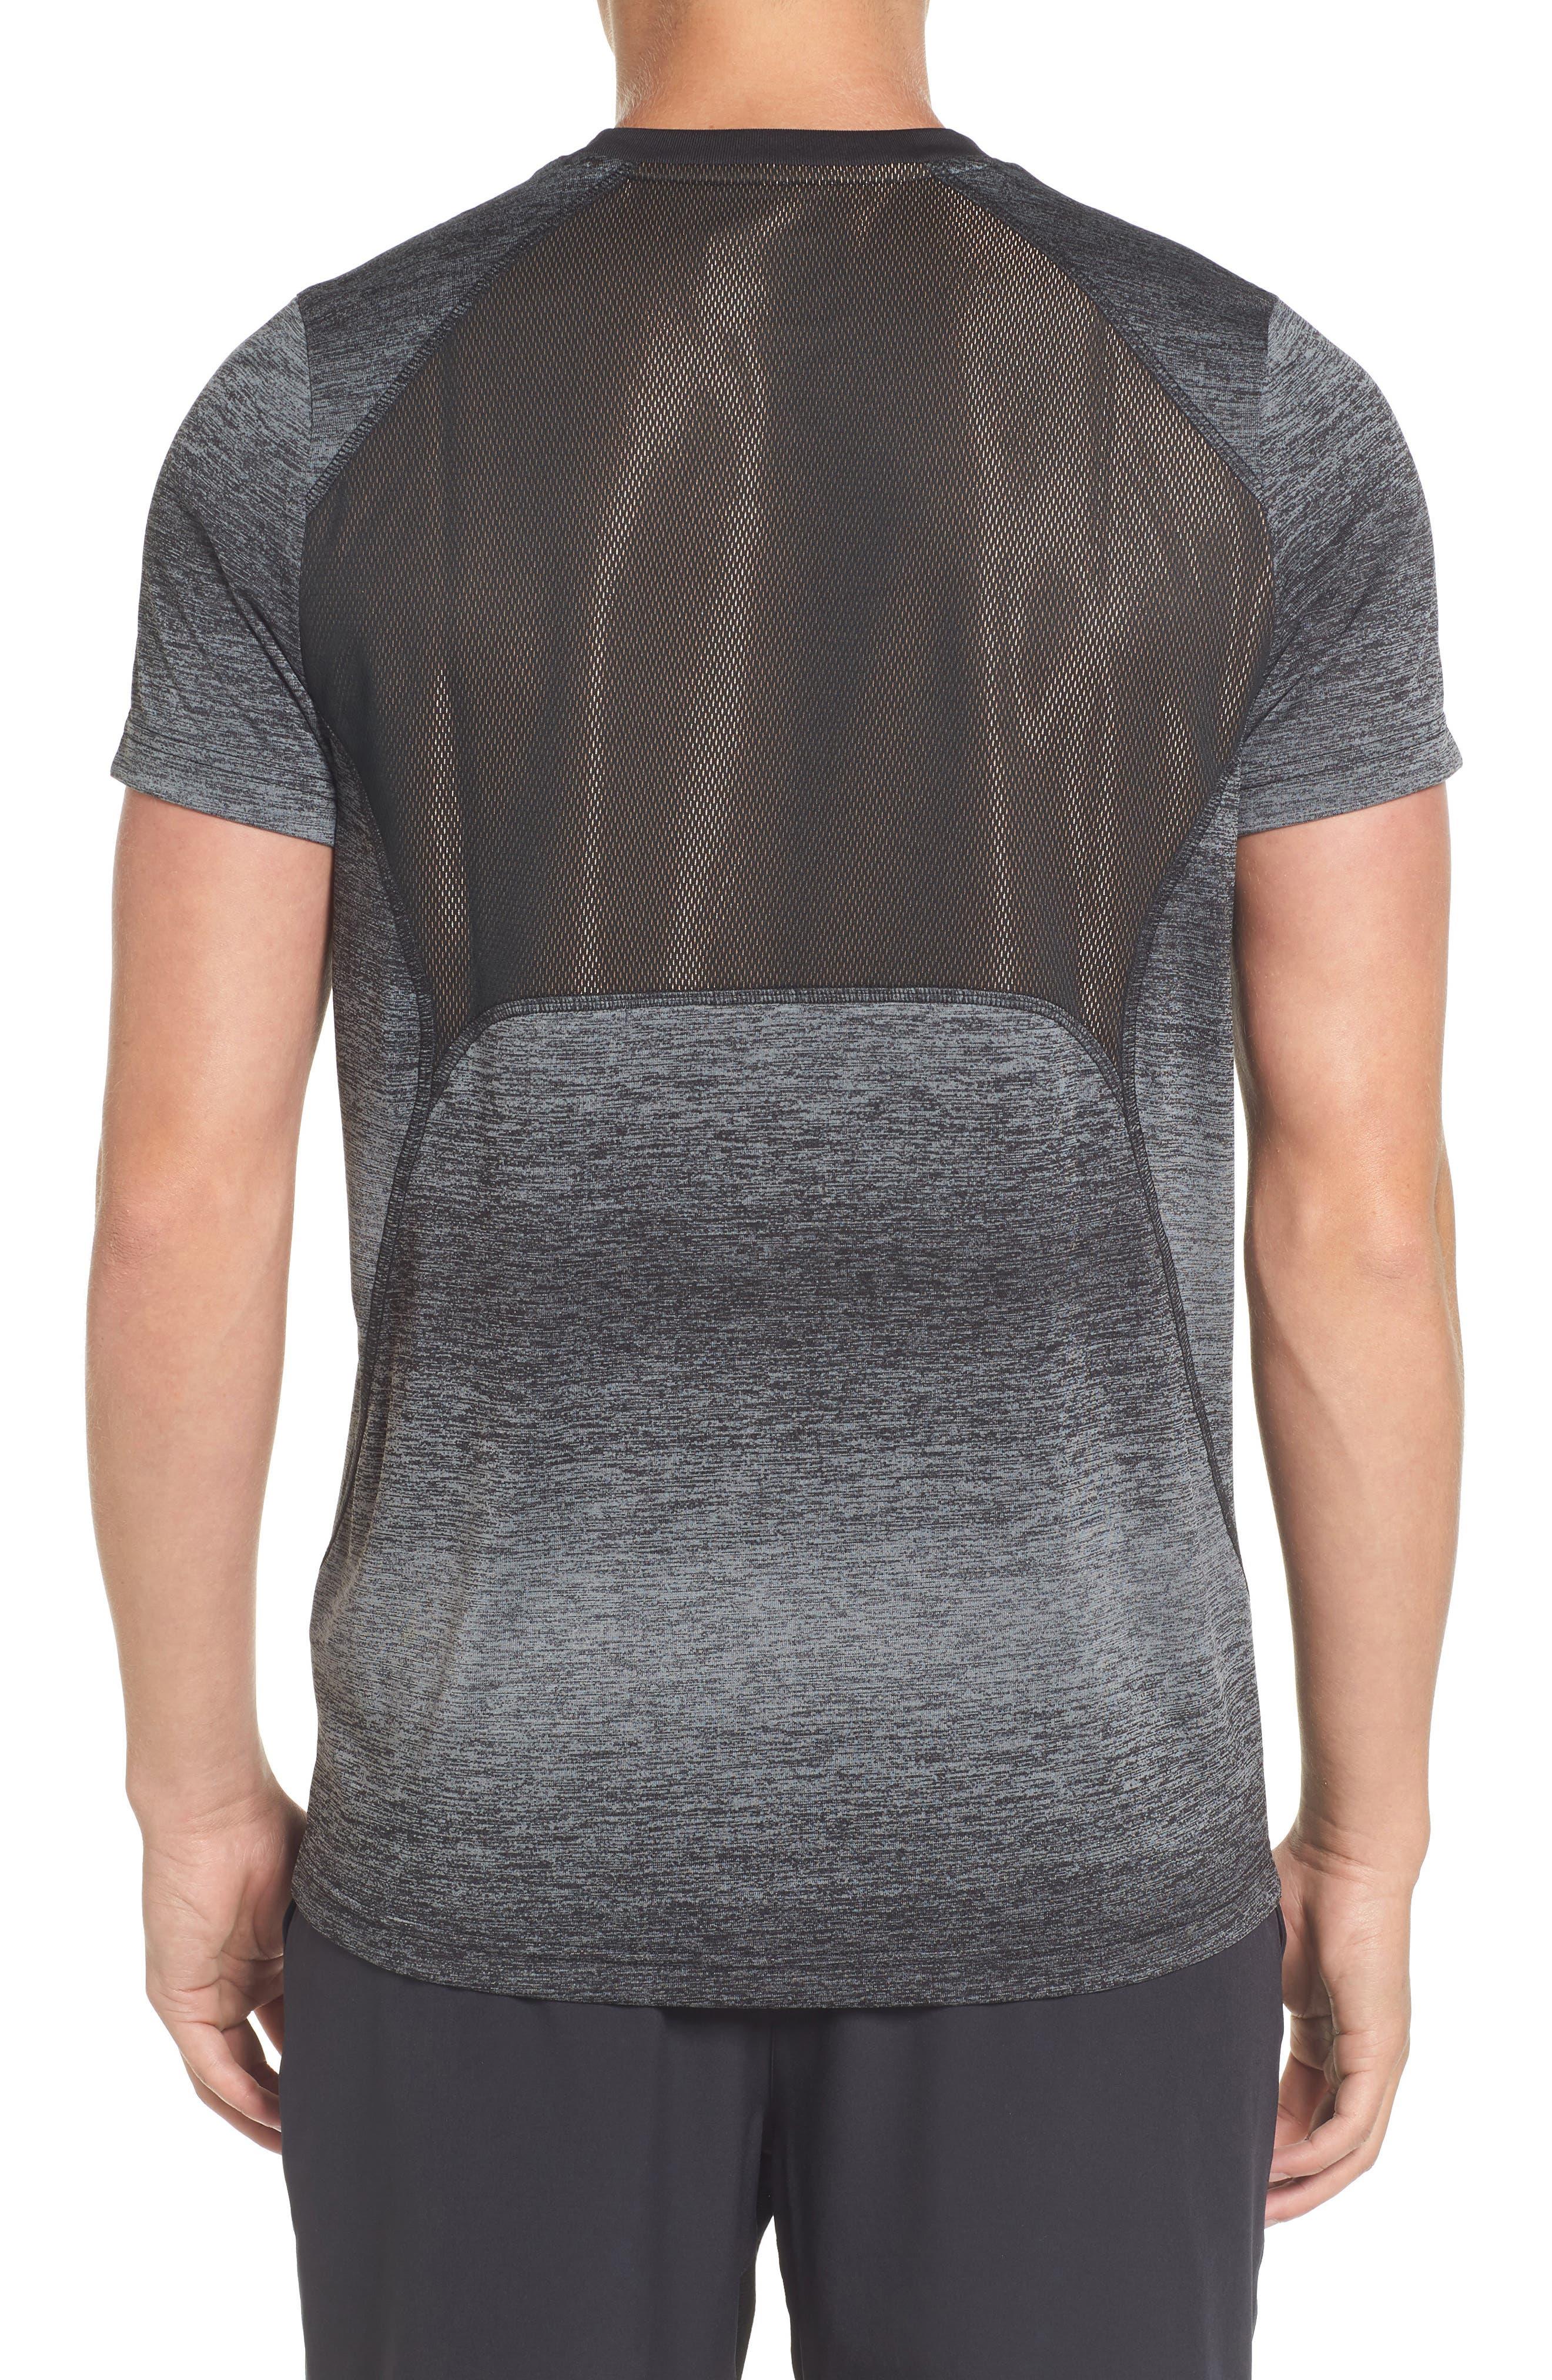 Ultra Dry Tech T-Shirt,                             Alternate thumbnail 2, color,                             Rk6 Black/ Black-Copper Orange